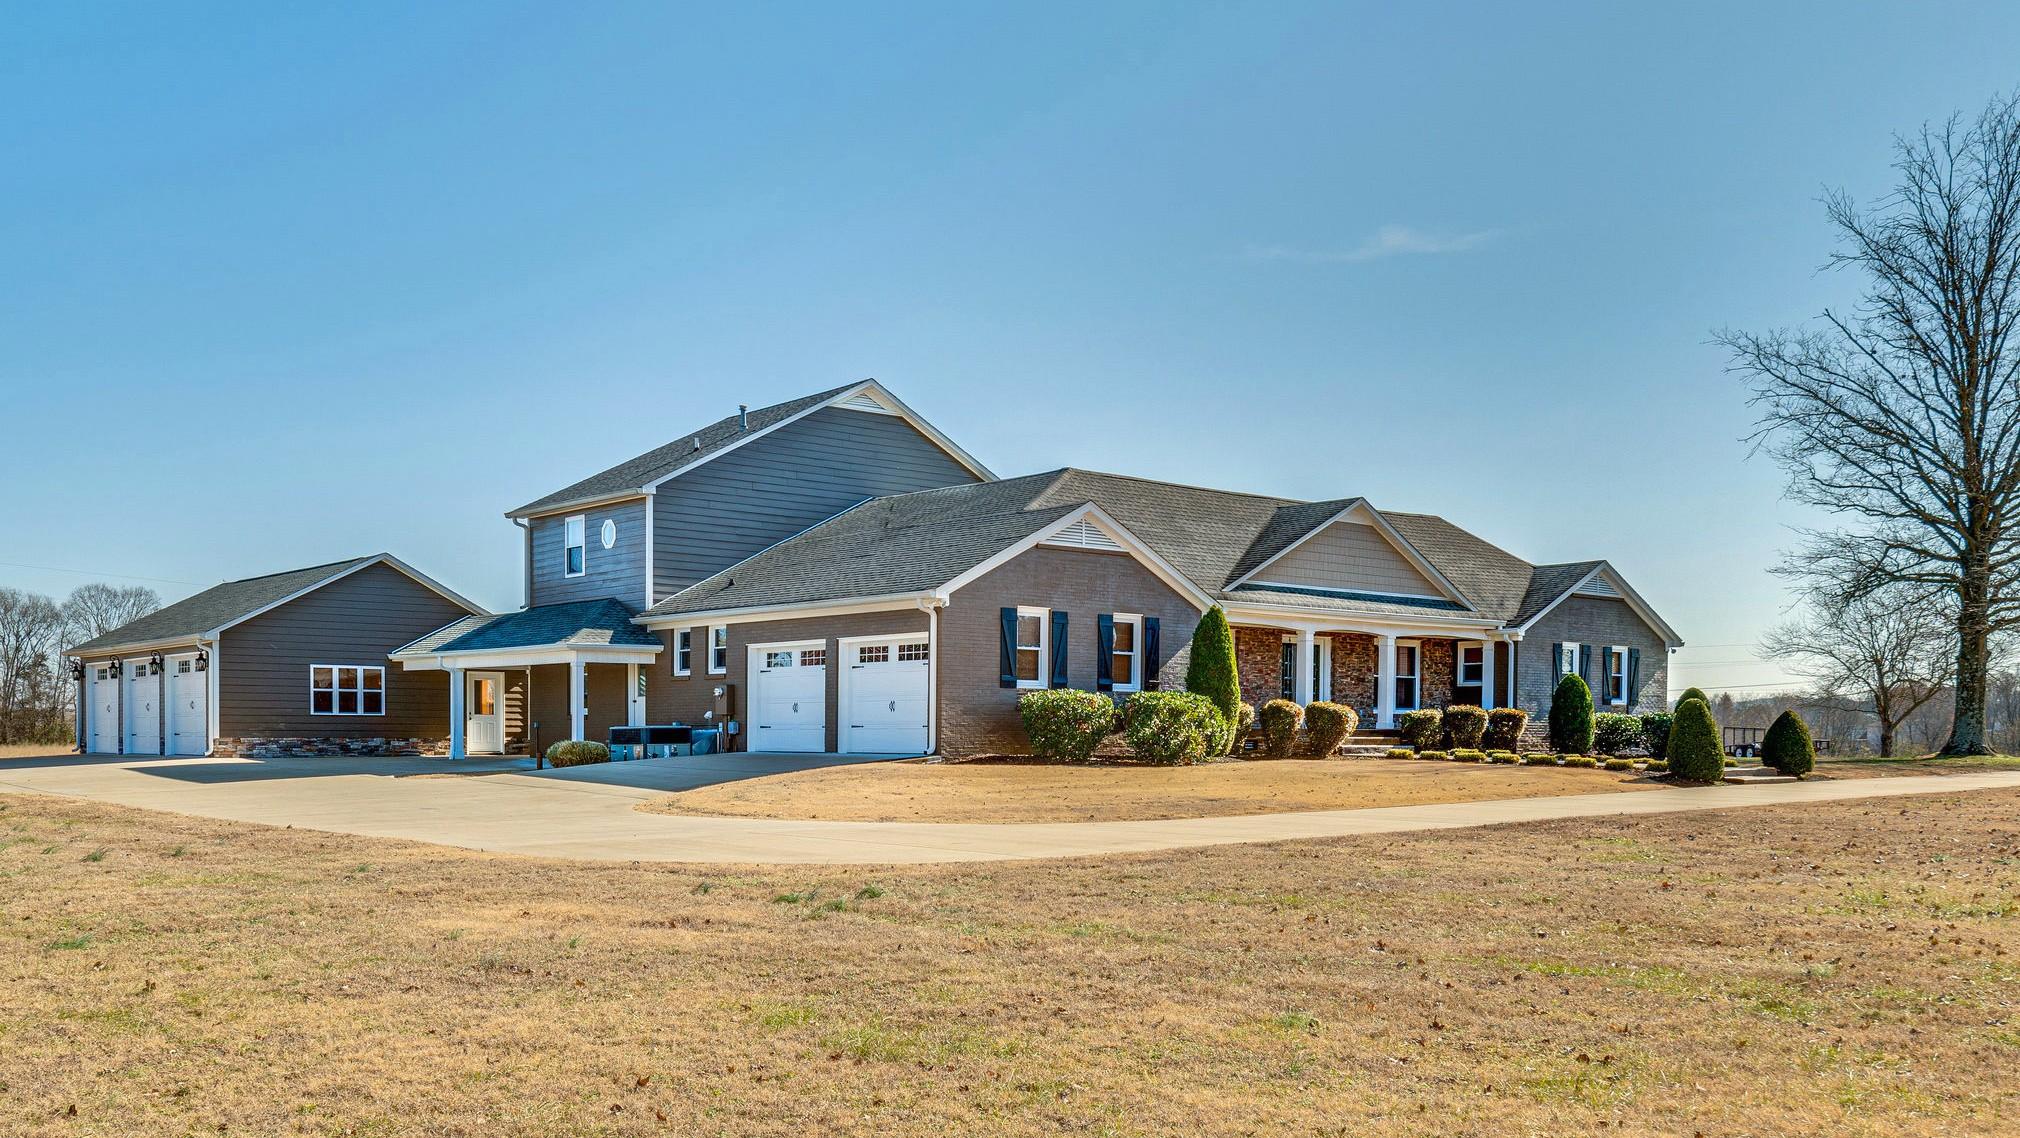 856 S Cross Bridges Rd, Mount Pleasant, TN 38474 - Mount Pleasant, TN real estate listing